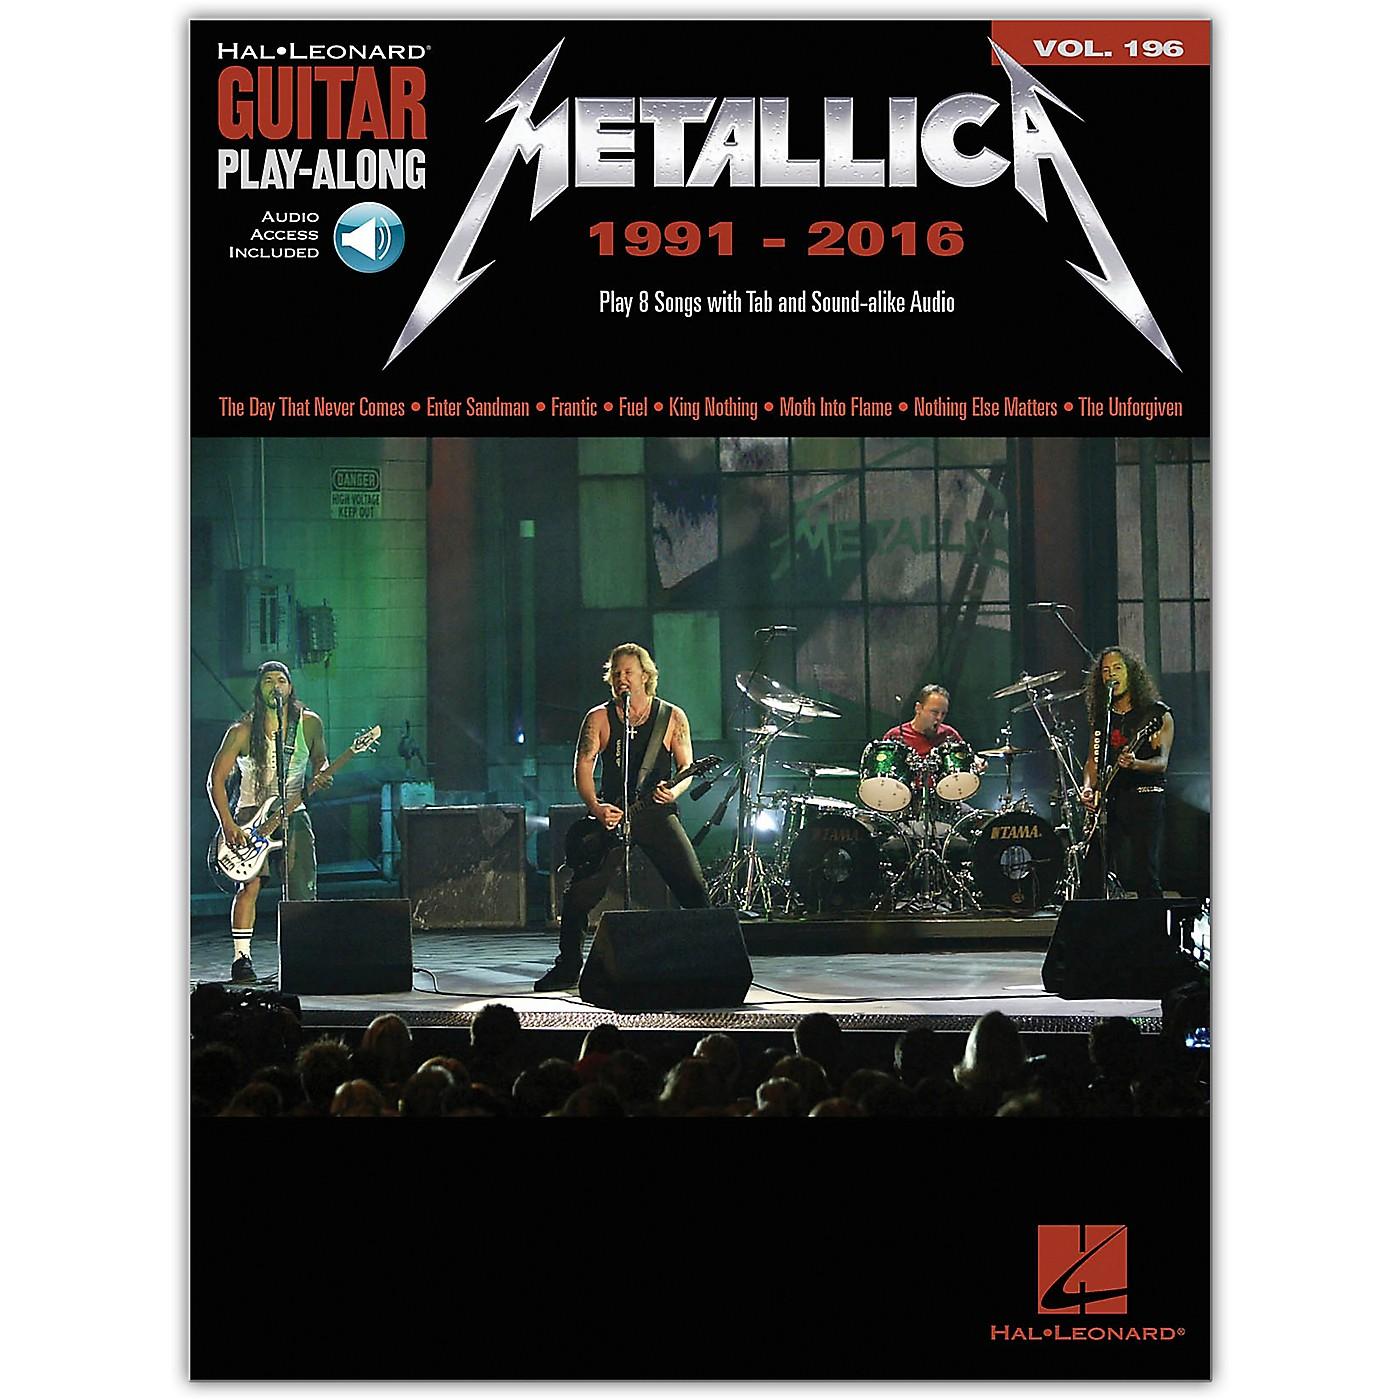 Hal Leonard Metallica: 1991-2016 Guitar Play-Along 196 Book/Audio Online thumbnail